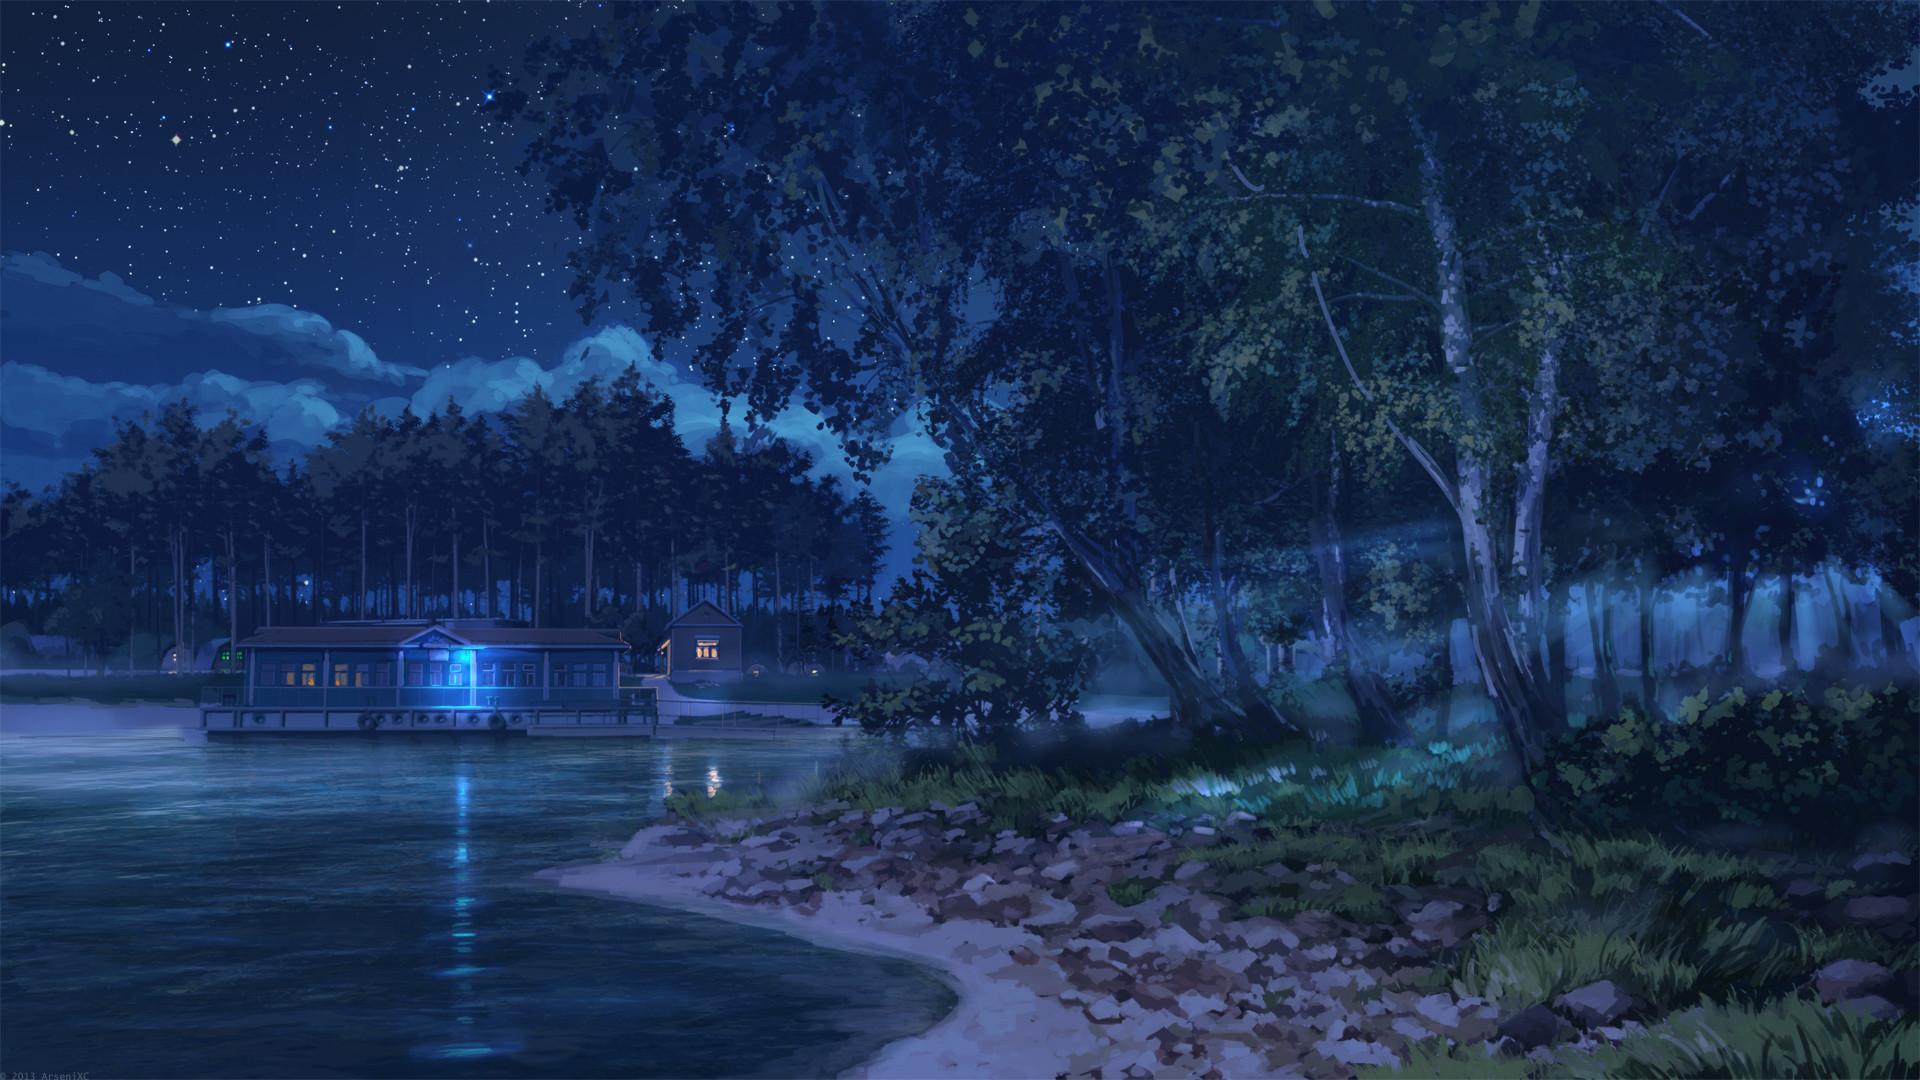 Night Anime Scenery Wallpaper Android – Bhstorm.com